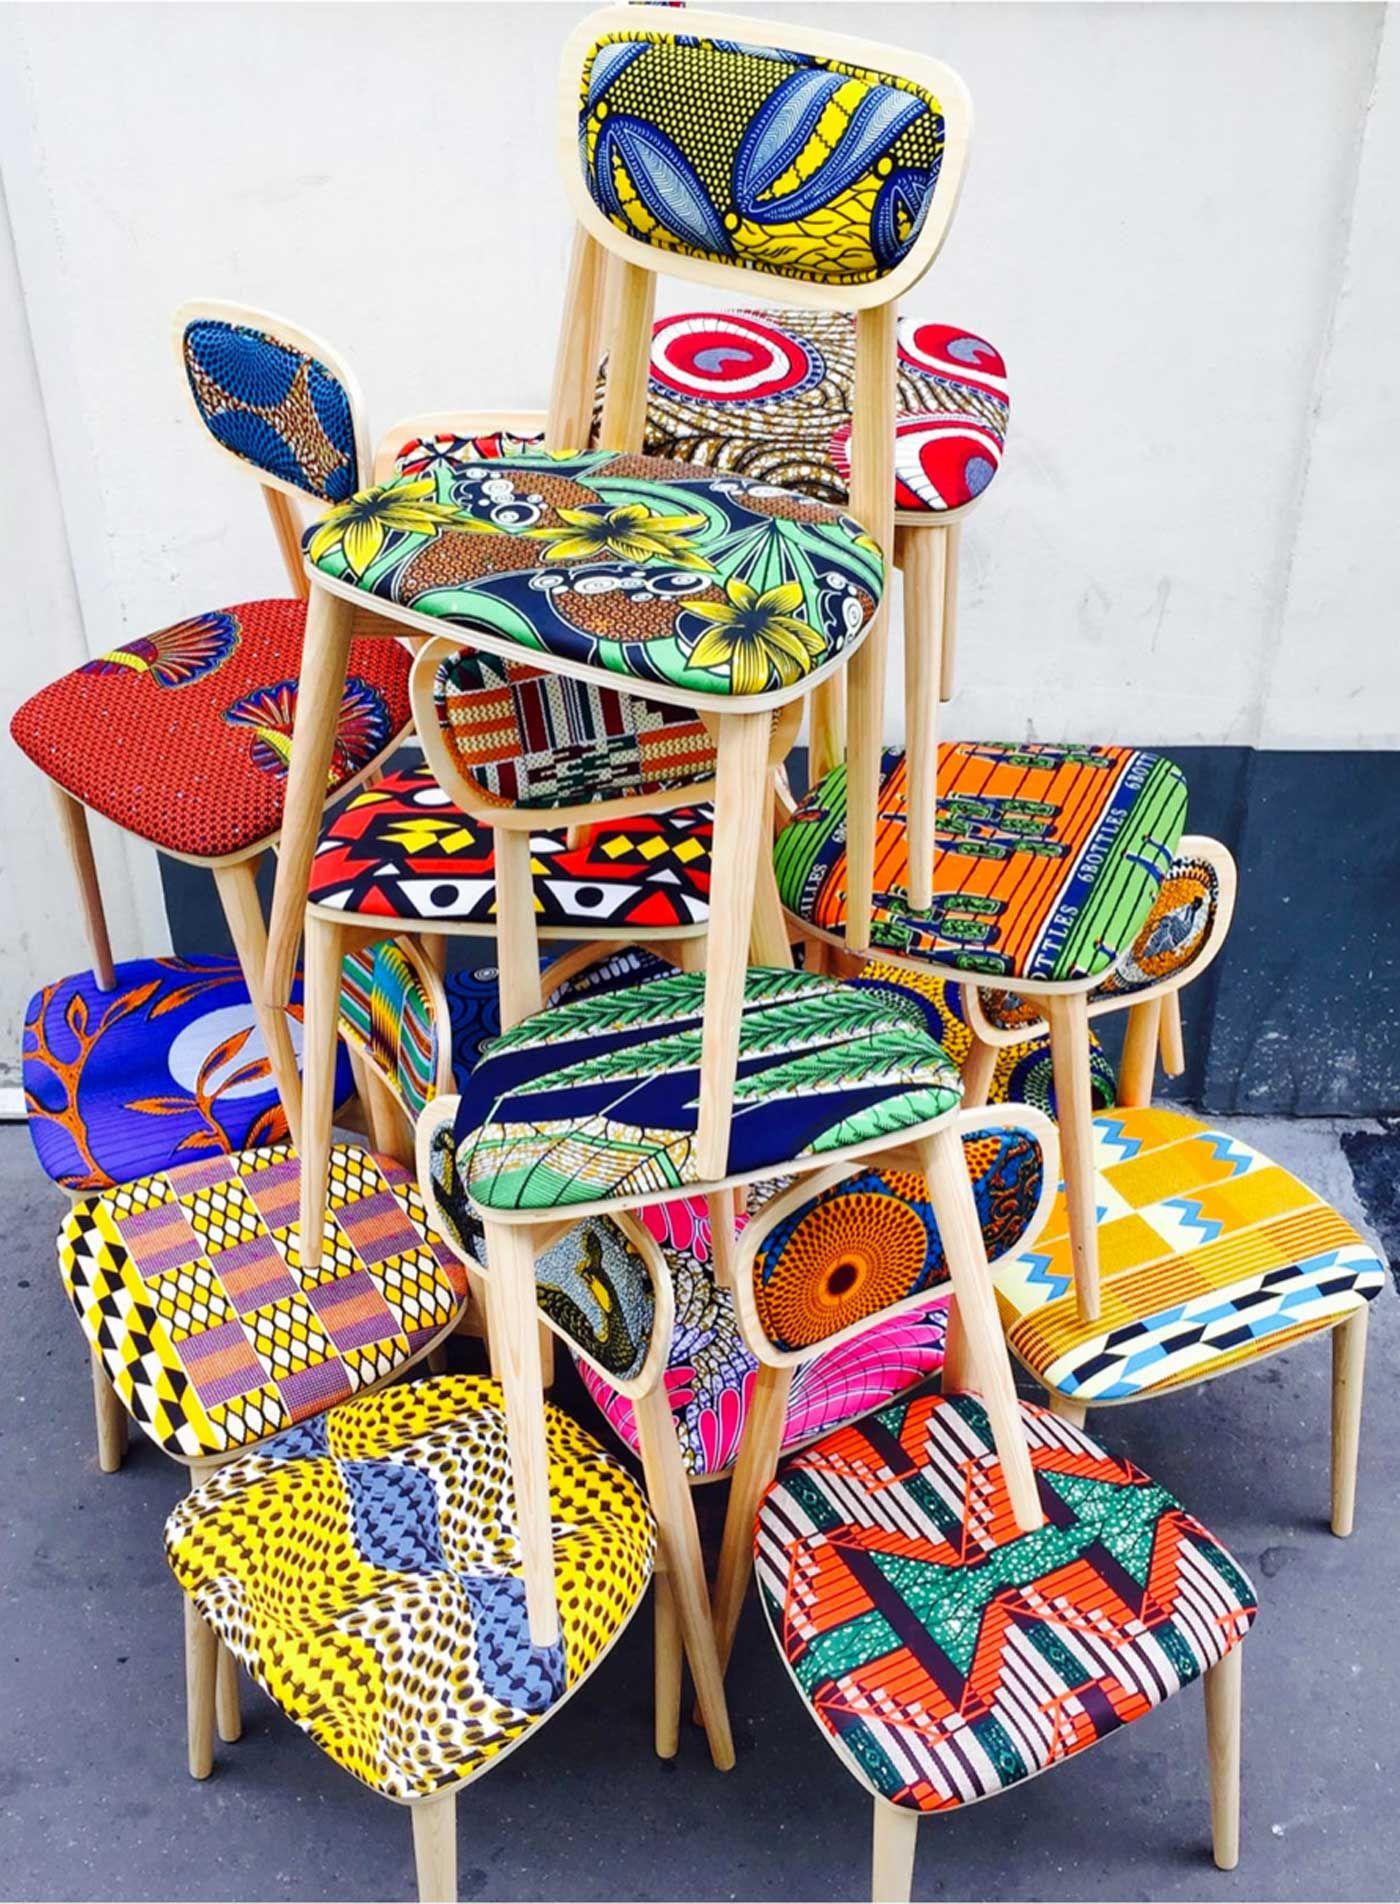 OnLes Sandrine AloufWhimsical Wax Chaises Tendances By Going OkN8wZnPX0